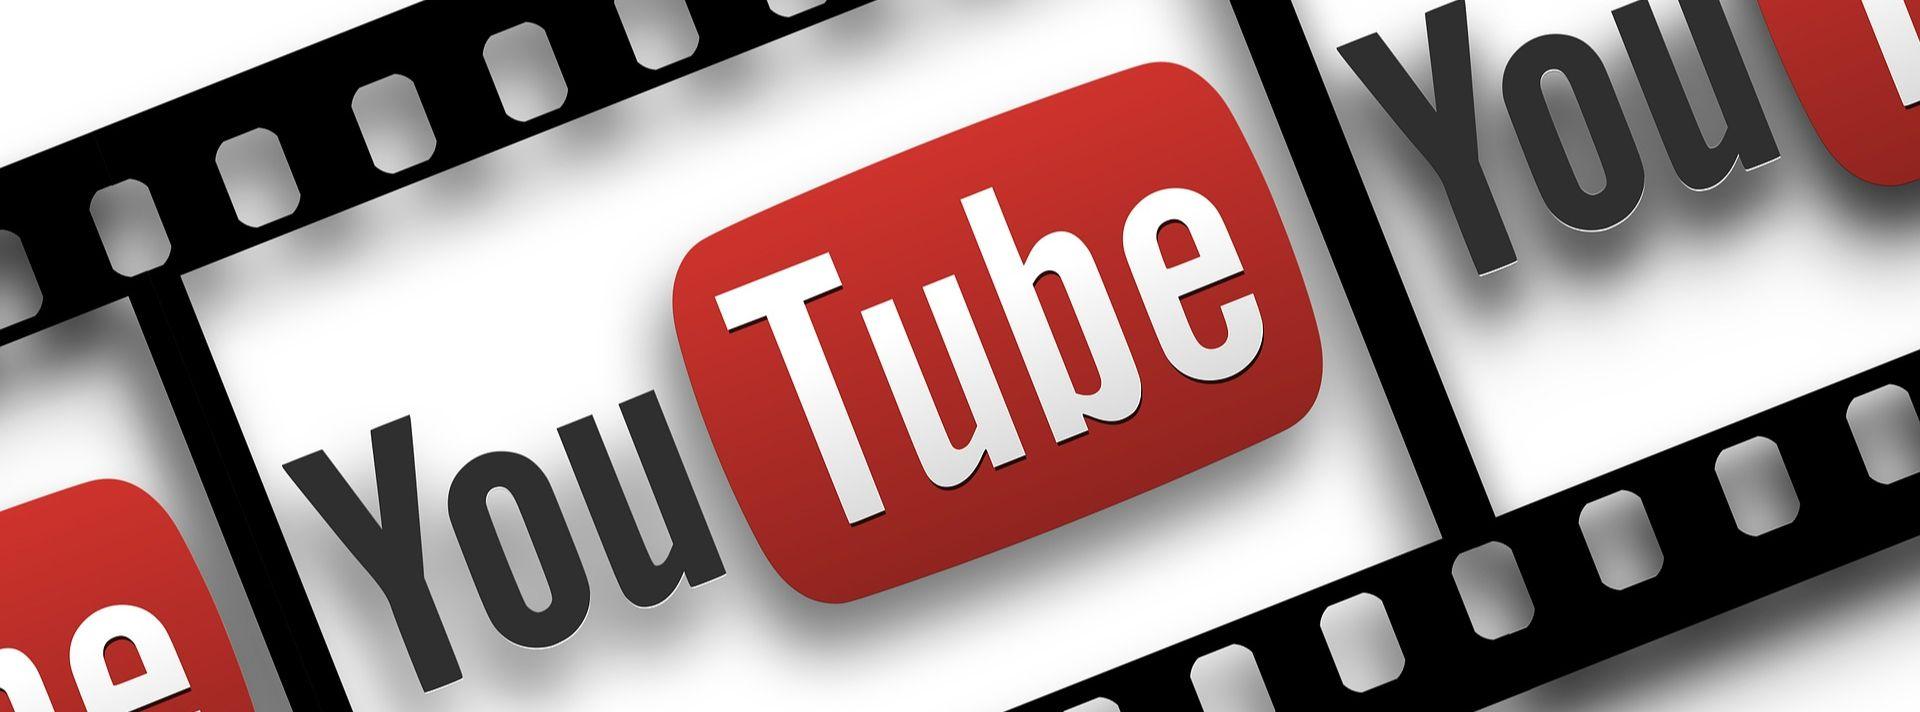 NIEUWE FILMPJES OP WEBSITE & YOUTUBE